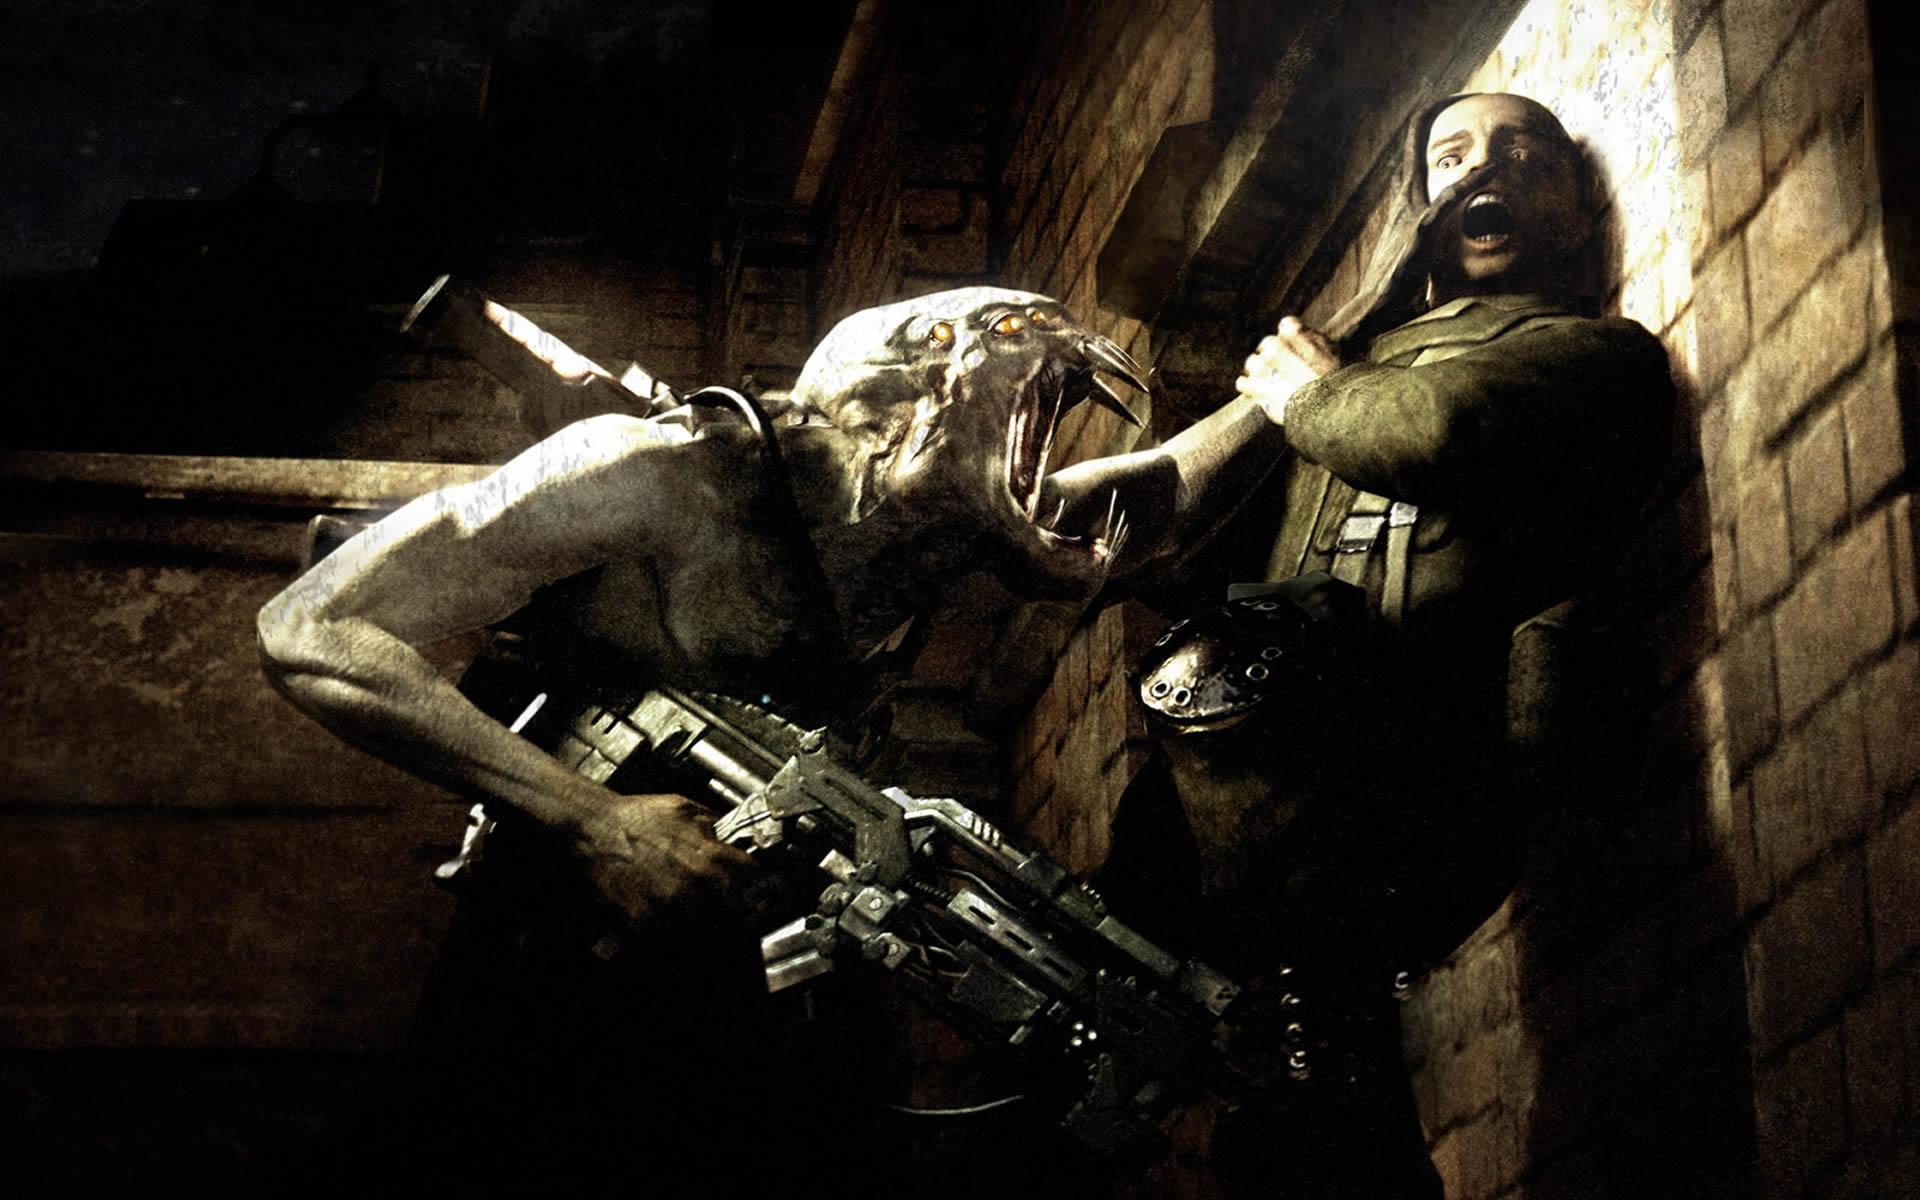 Chimeran Soldier Pins Man Against Wall